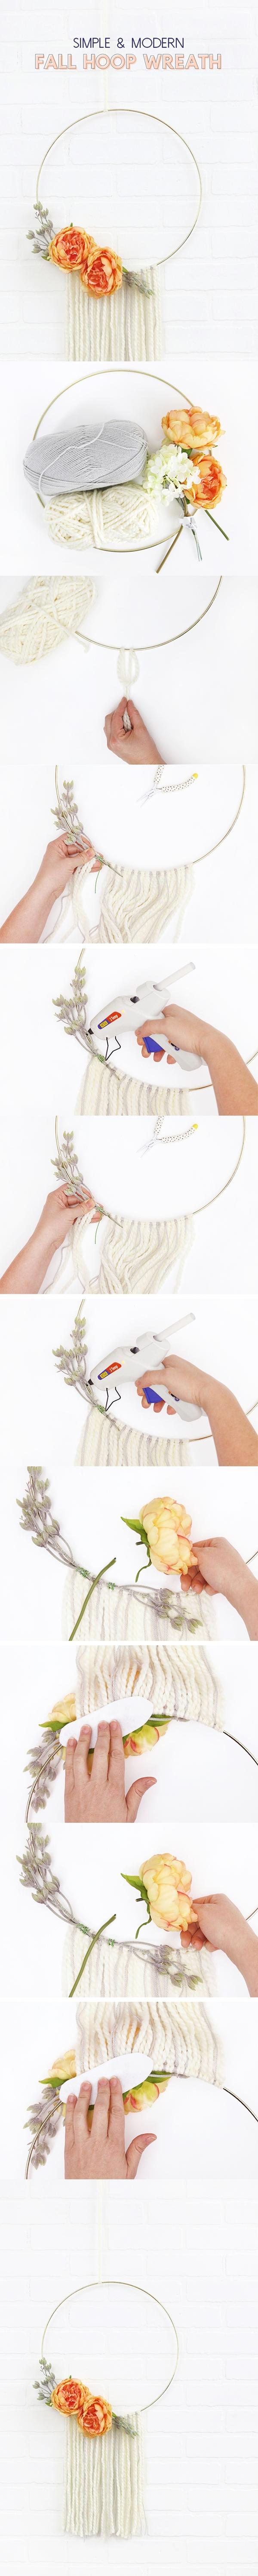 diy-wreath-tutorials-can-actually-put-use